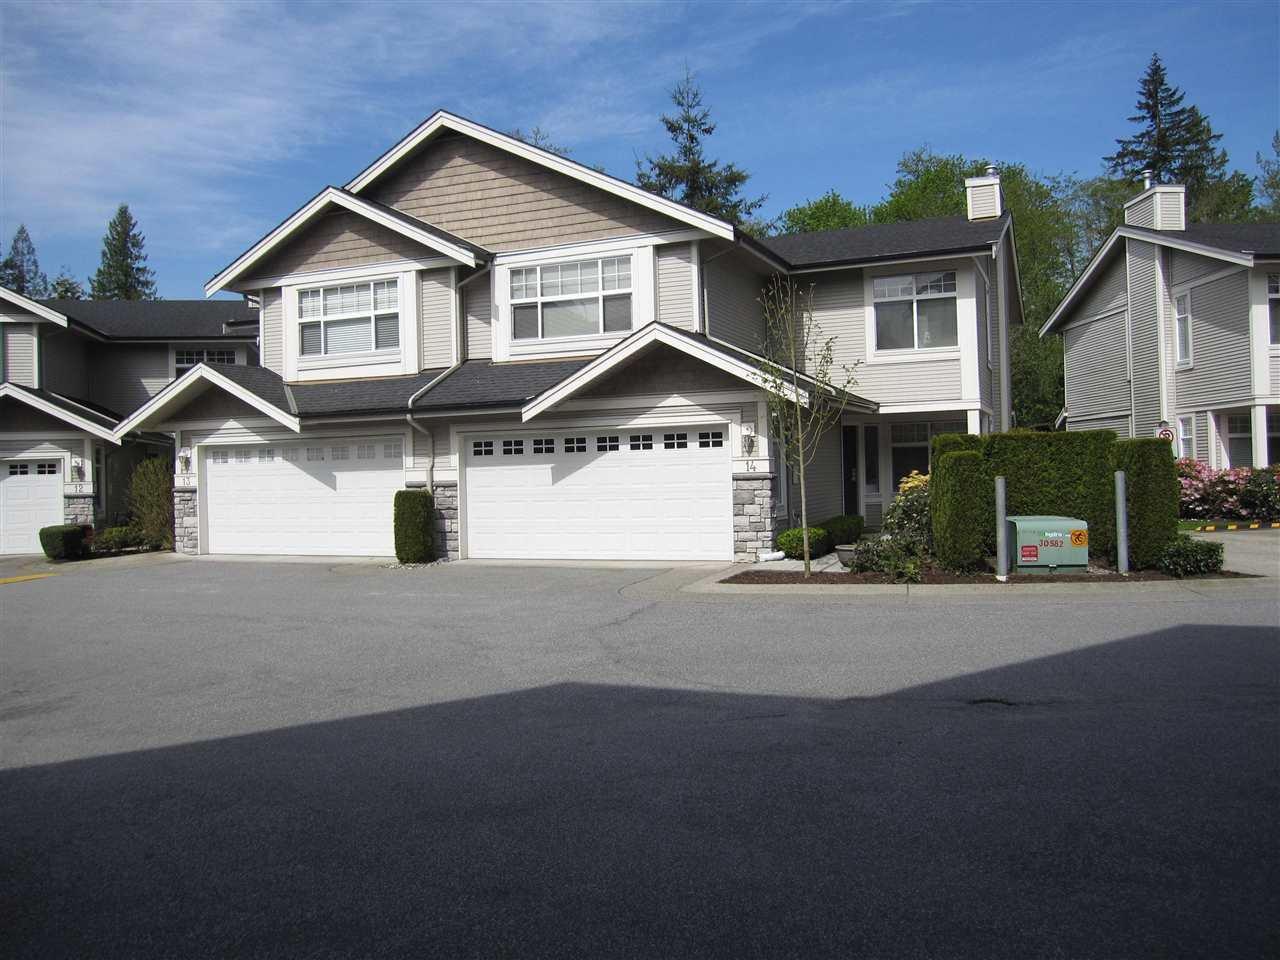 "Photo 1: Photos: 14 23343 KANAKA Way in Maple Ridge: Cottonwood MR Townhouse for sale in ""COTTONWOOD GROVE"" : MLS®# R2164779"